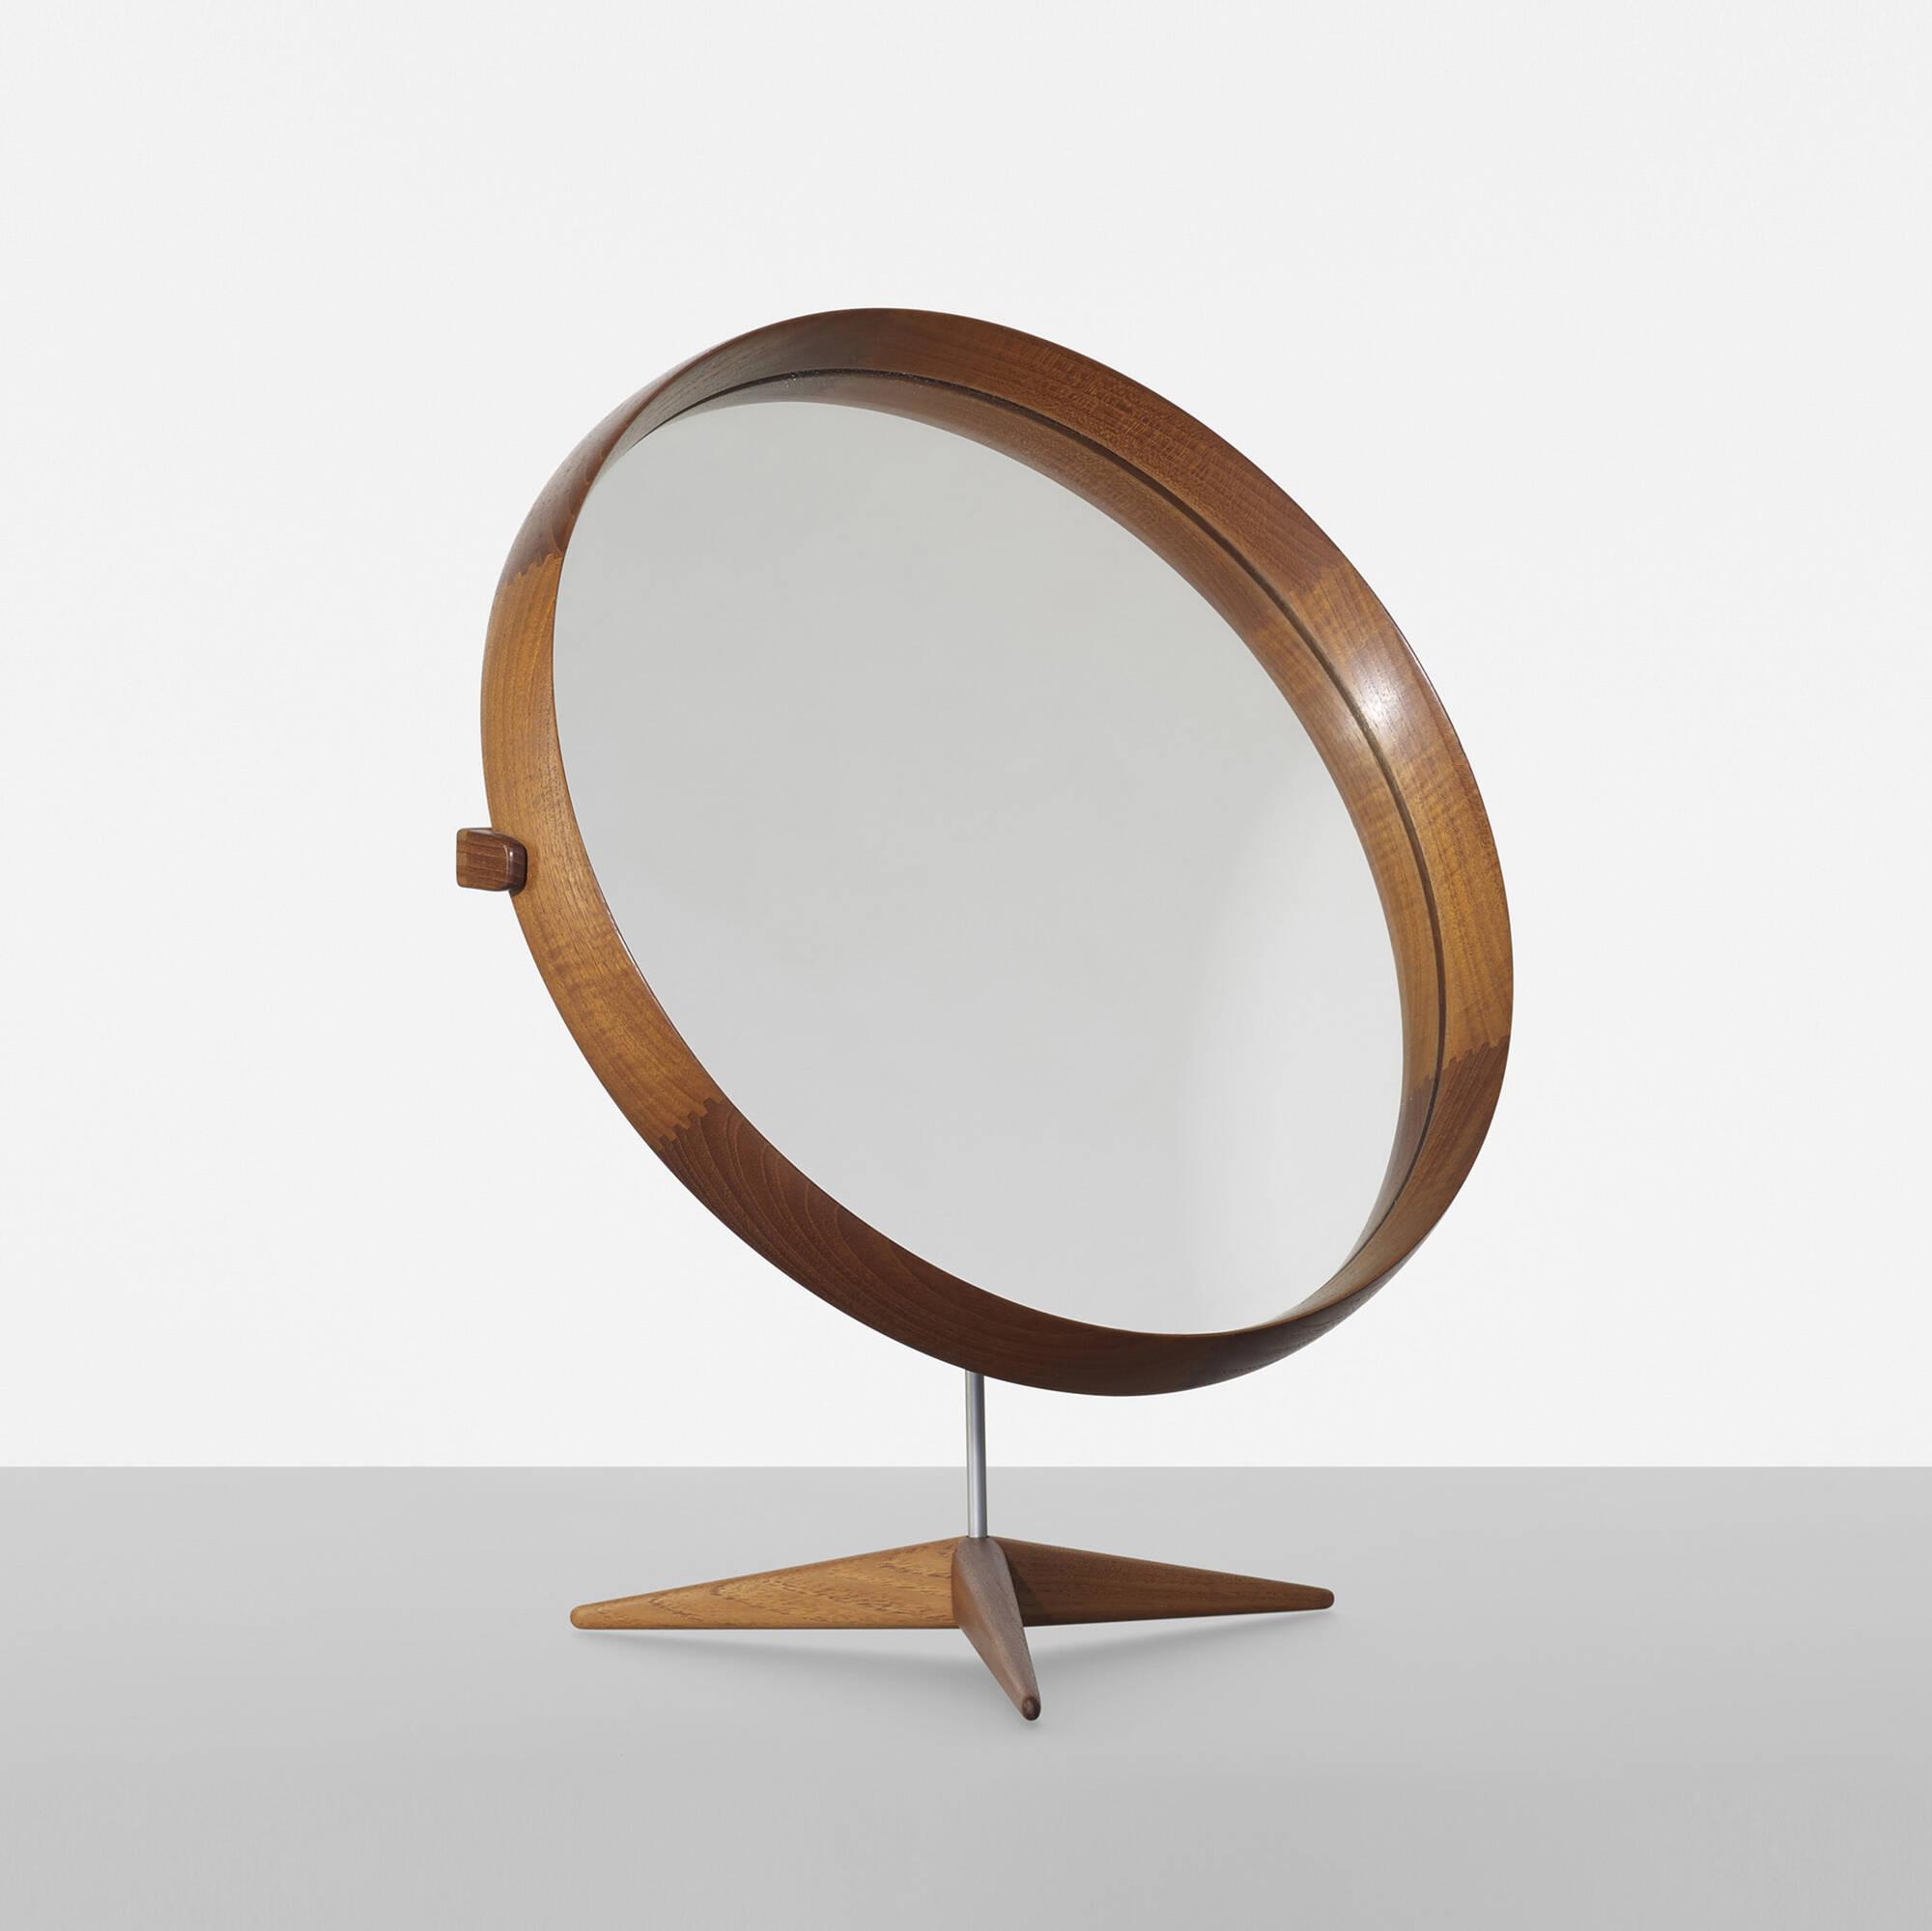 149: Uno and Östen Kristiansson / mirror (1 of 5)